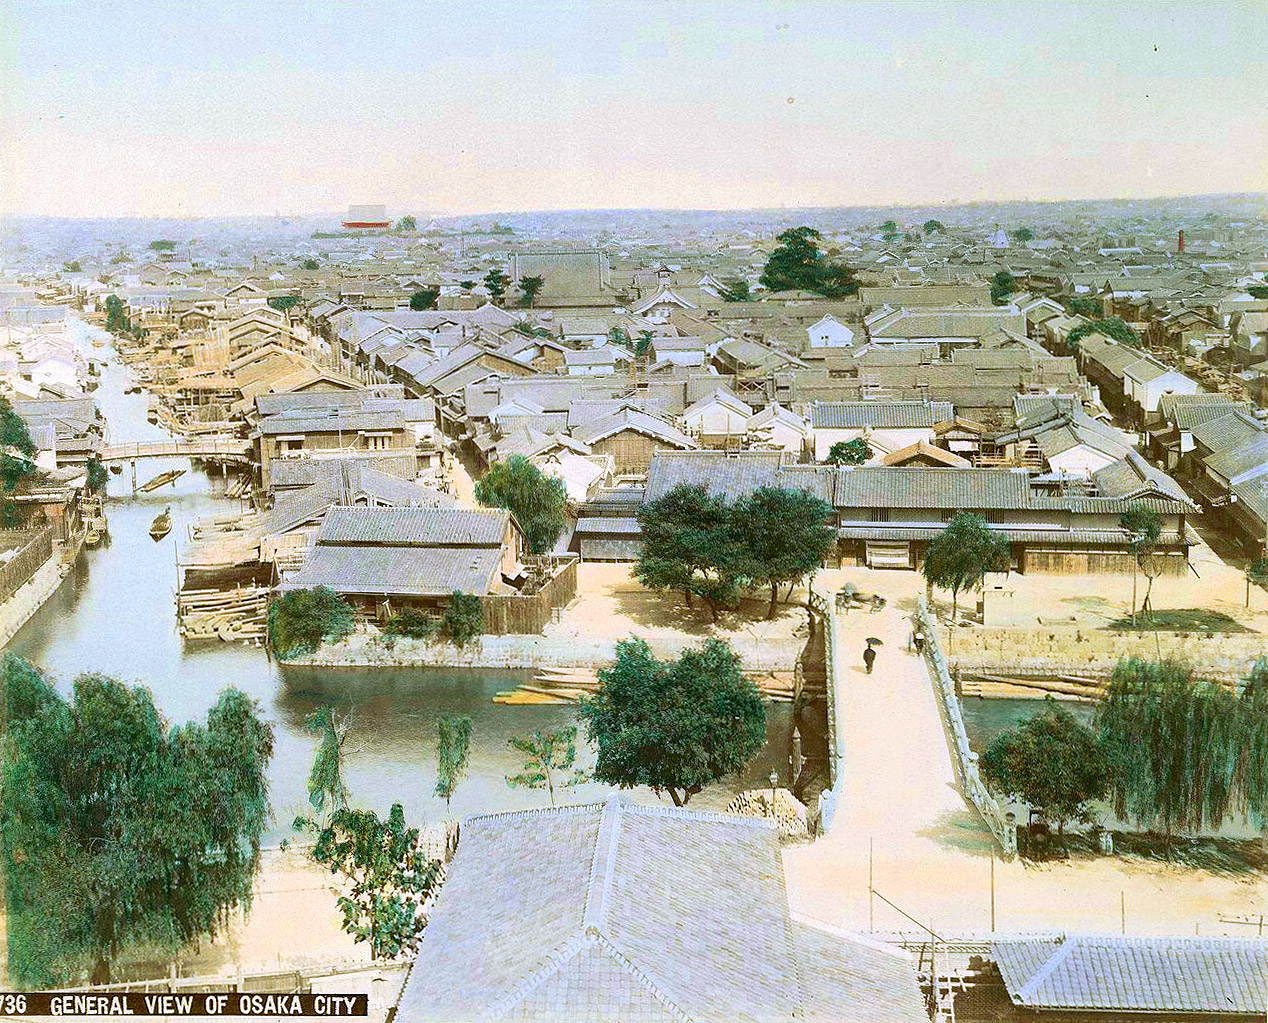 1870 General View of Osaka City.jpg